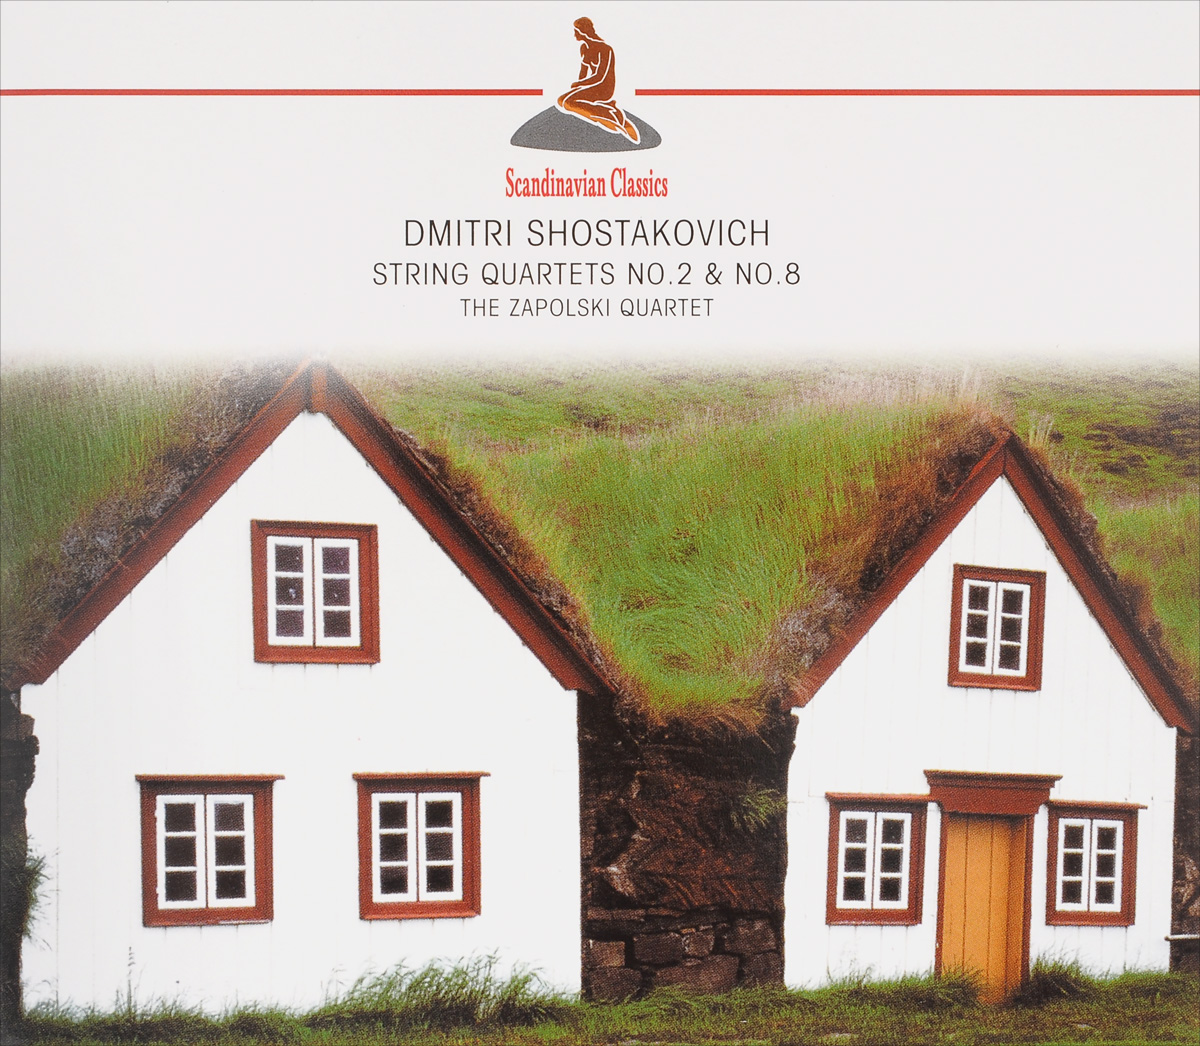 Zapolski Quartet Scandinavian Classics. Zapolski Quartet. Dmitri Schostakowitch. String Quartets No. 2 & No. 8 недорого